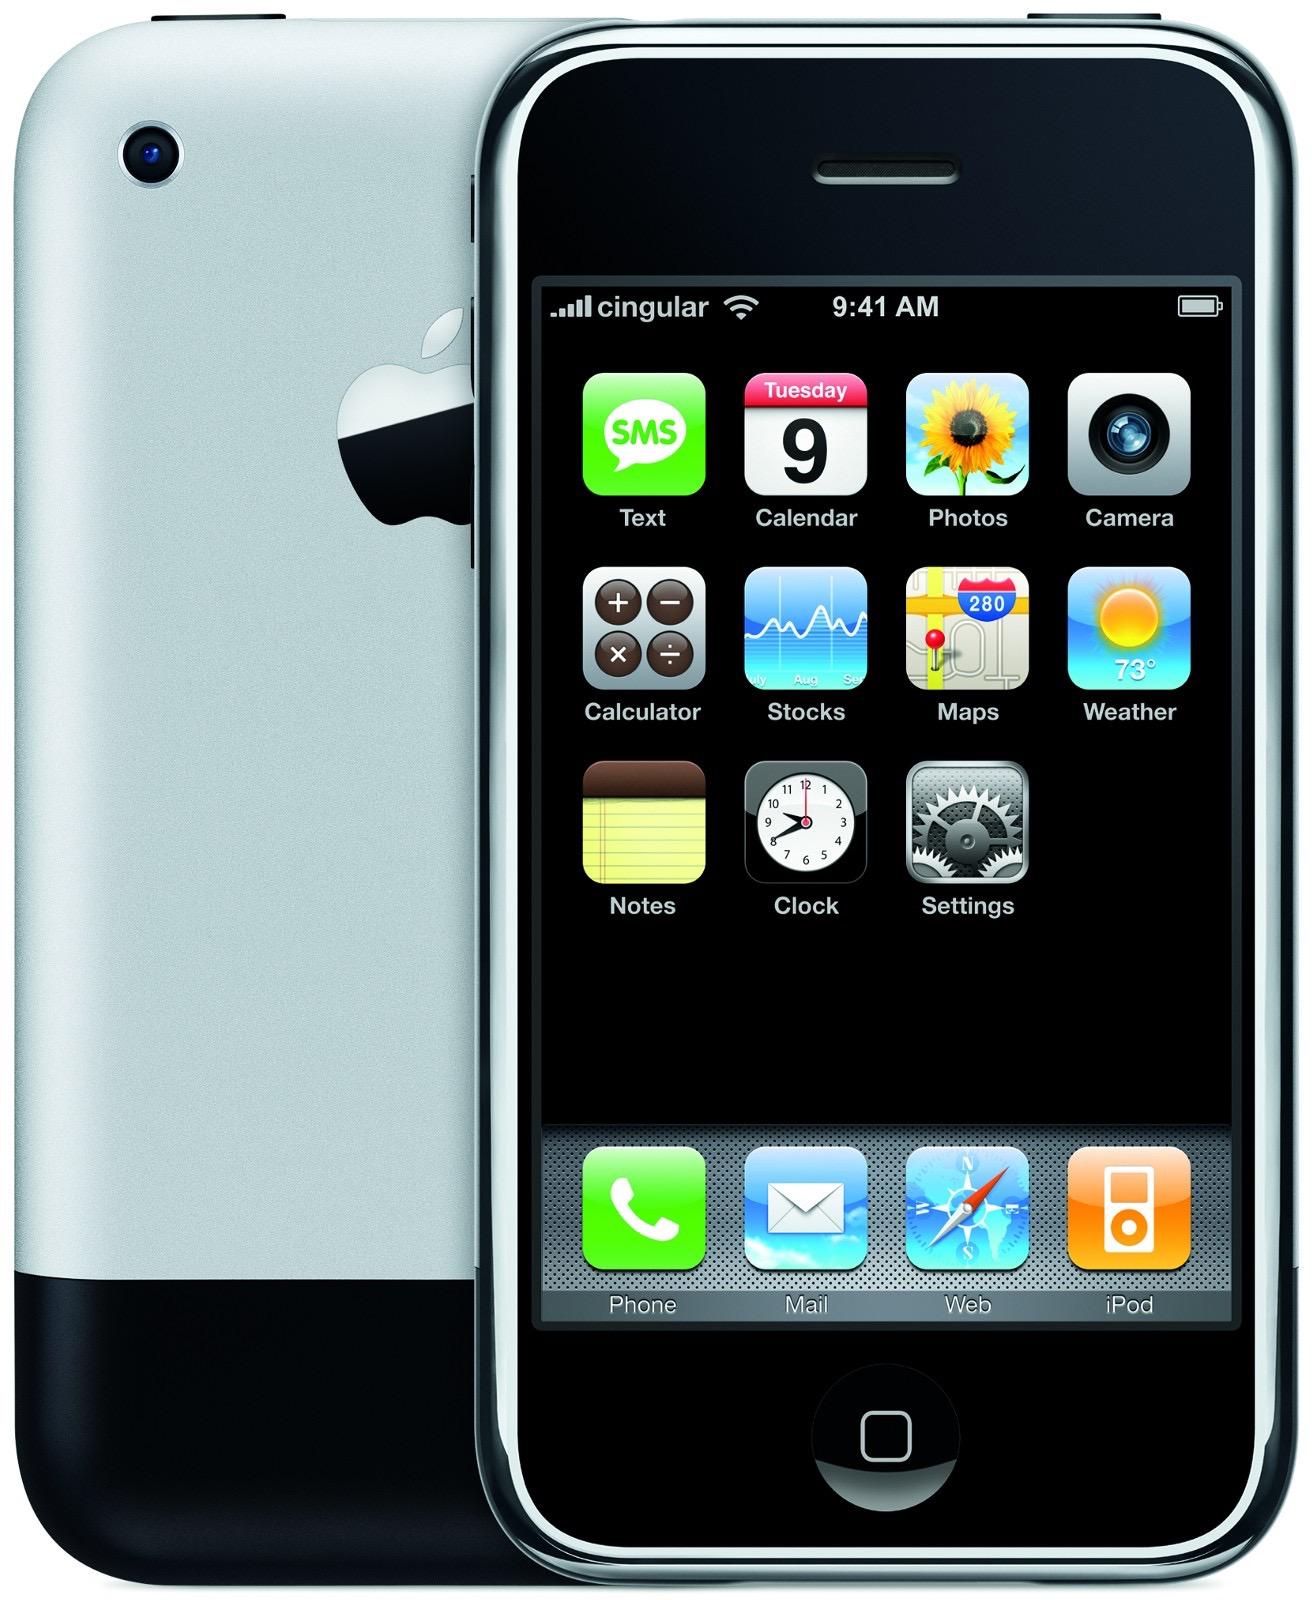 Gambar promosi iPhone asli